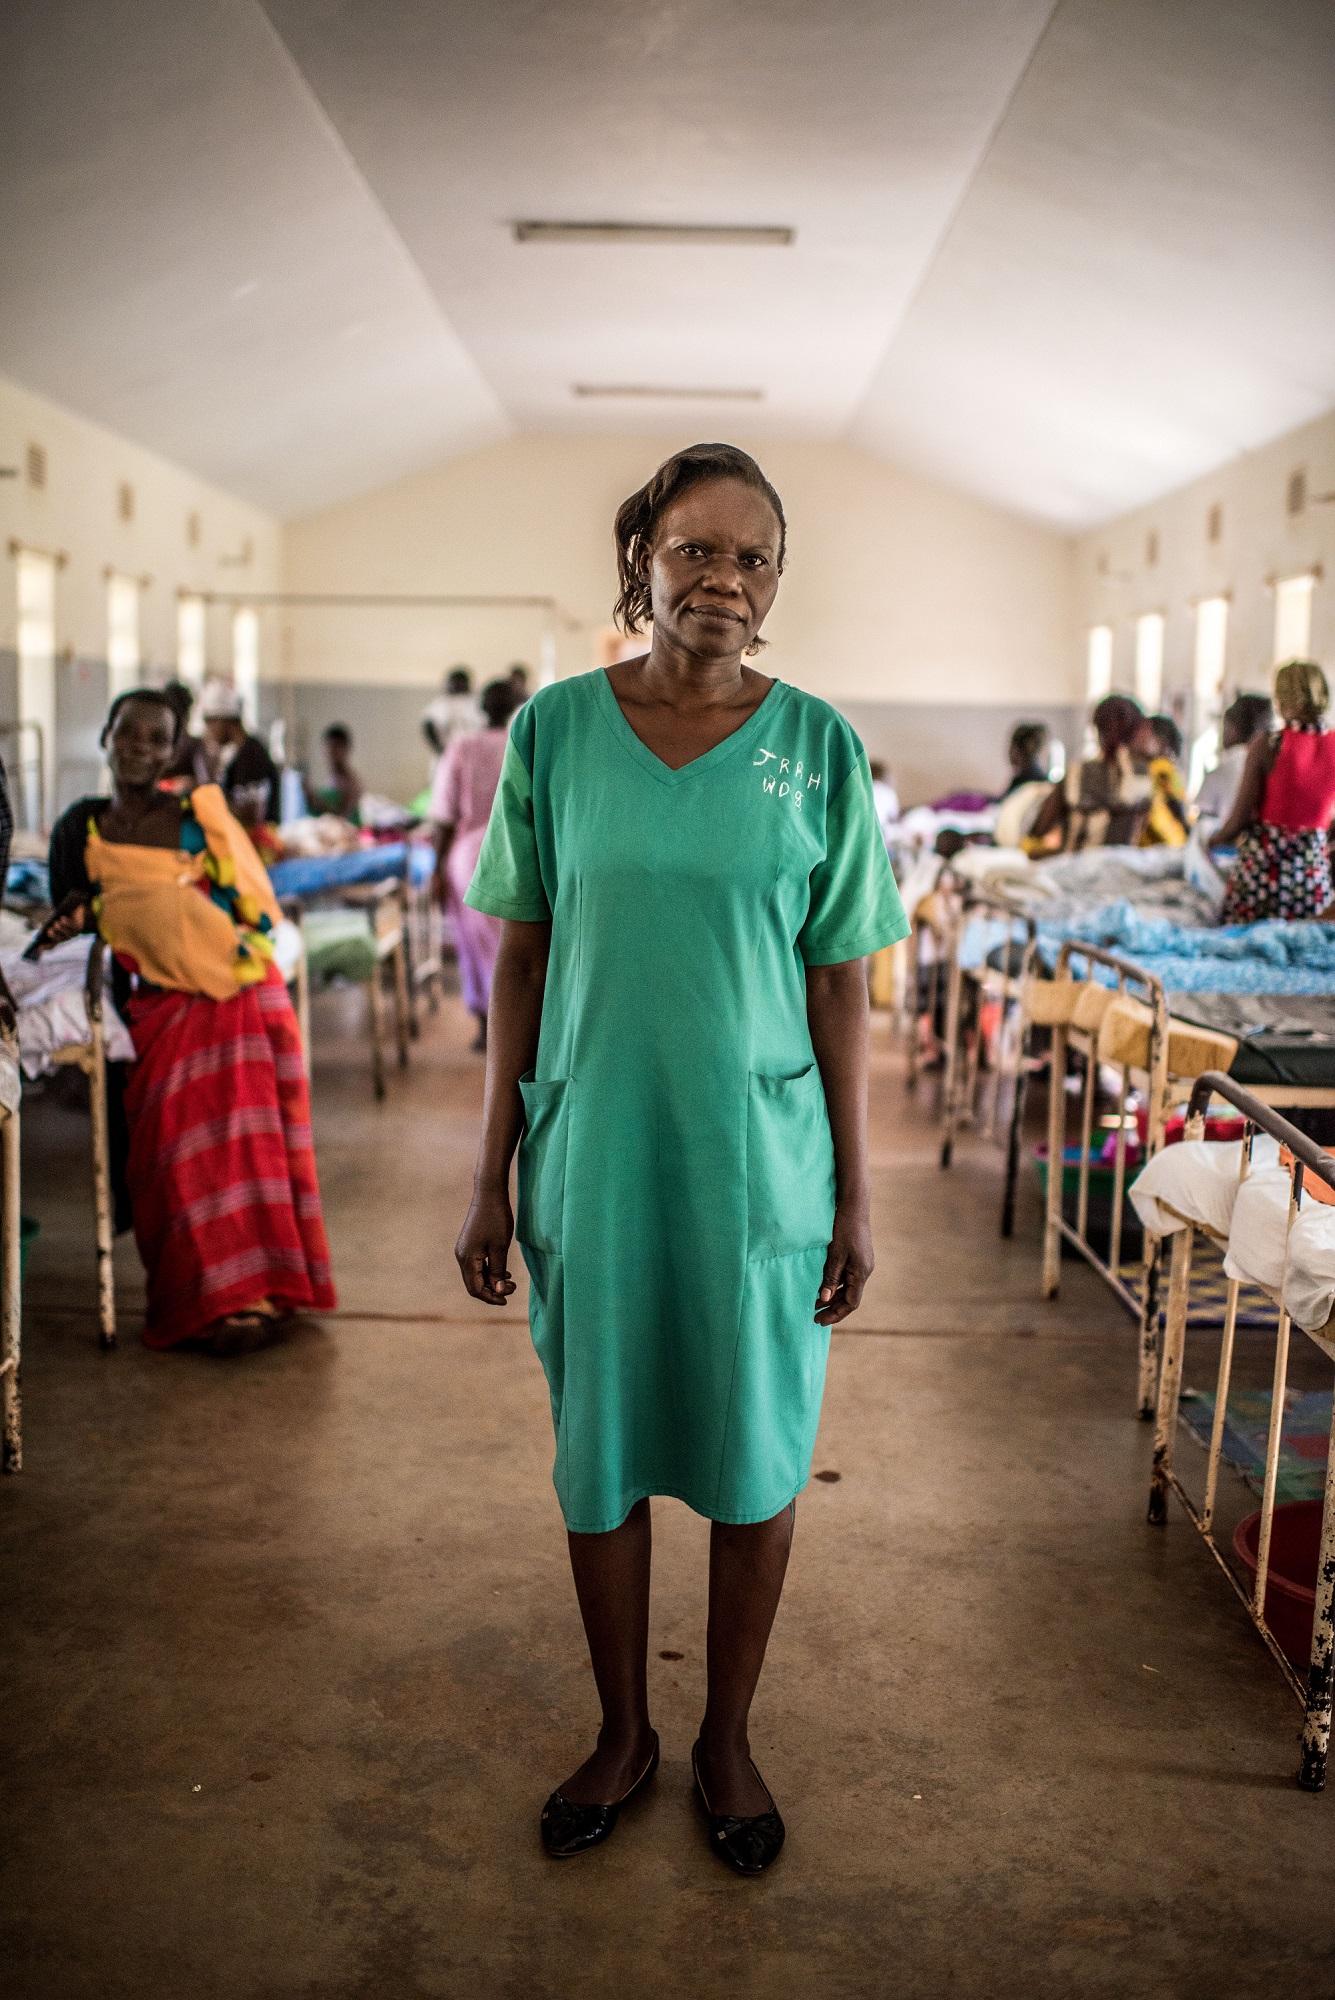 Midwife Mary Babiry photographed in the maternity ward of the Jinja Regional Referral Hospital in Jinja, Uganda.